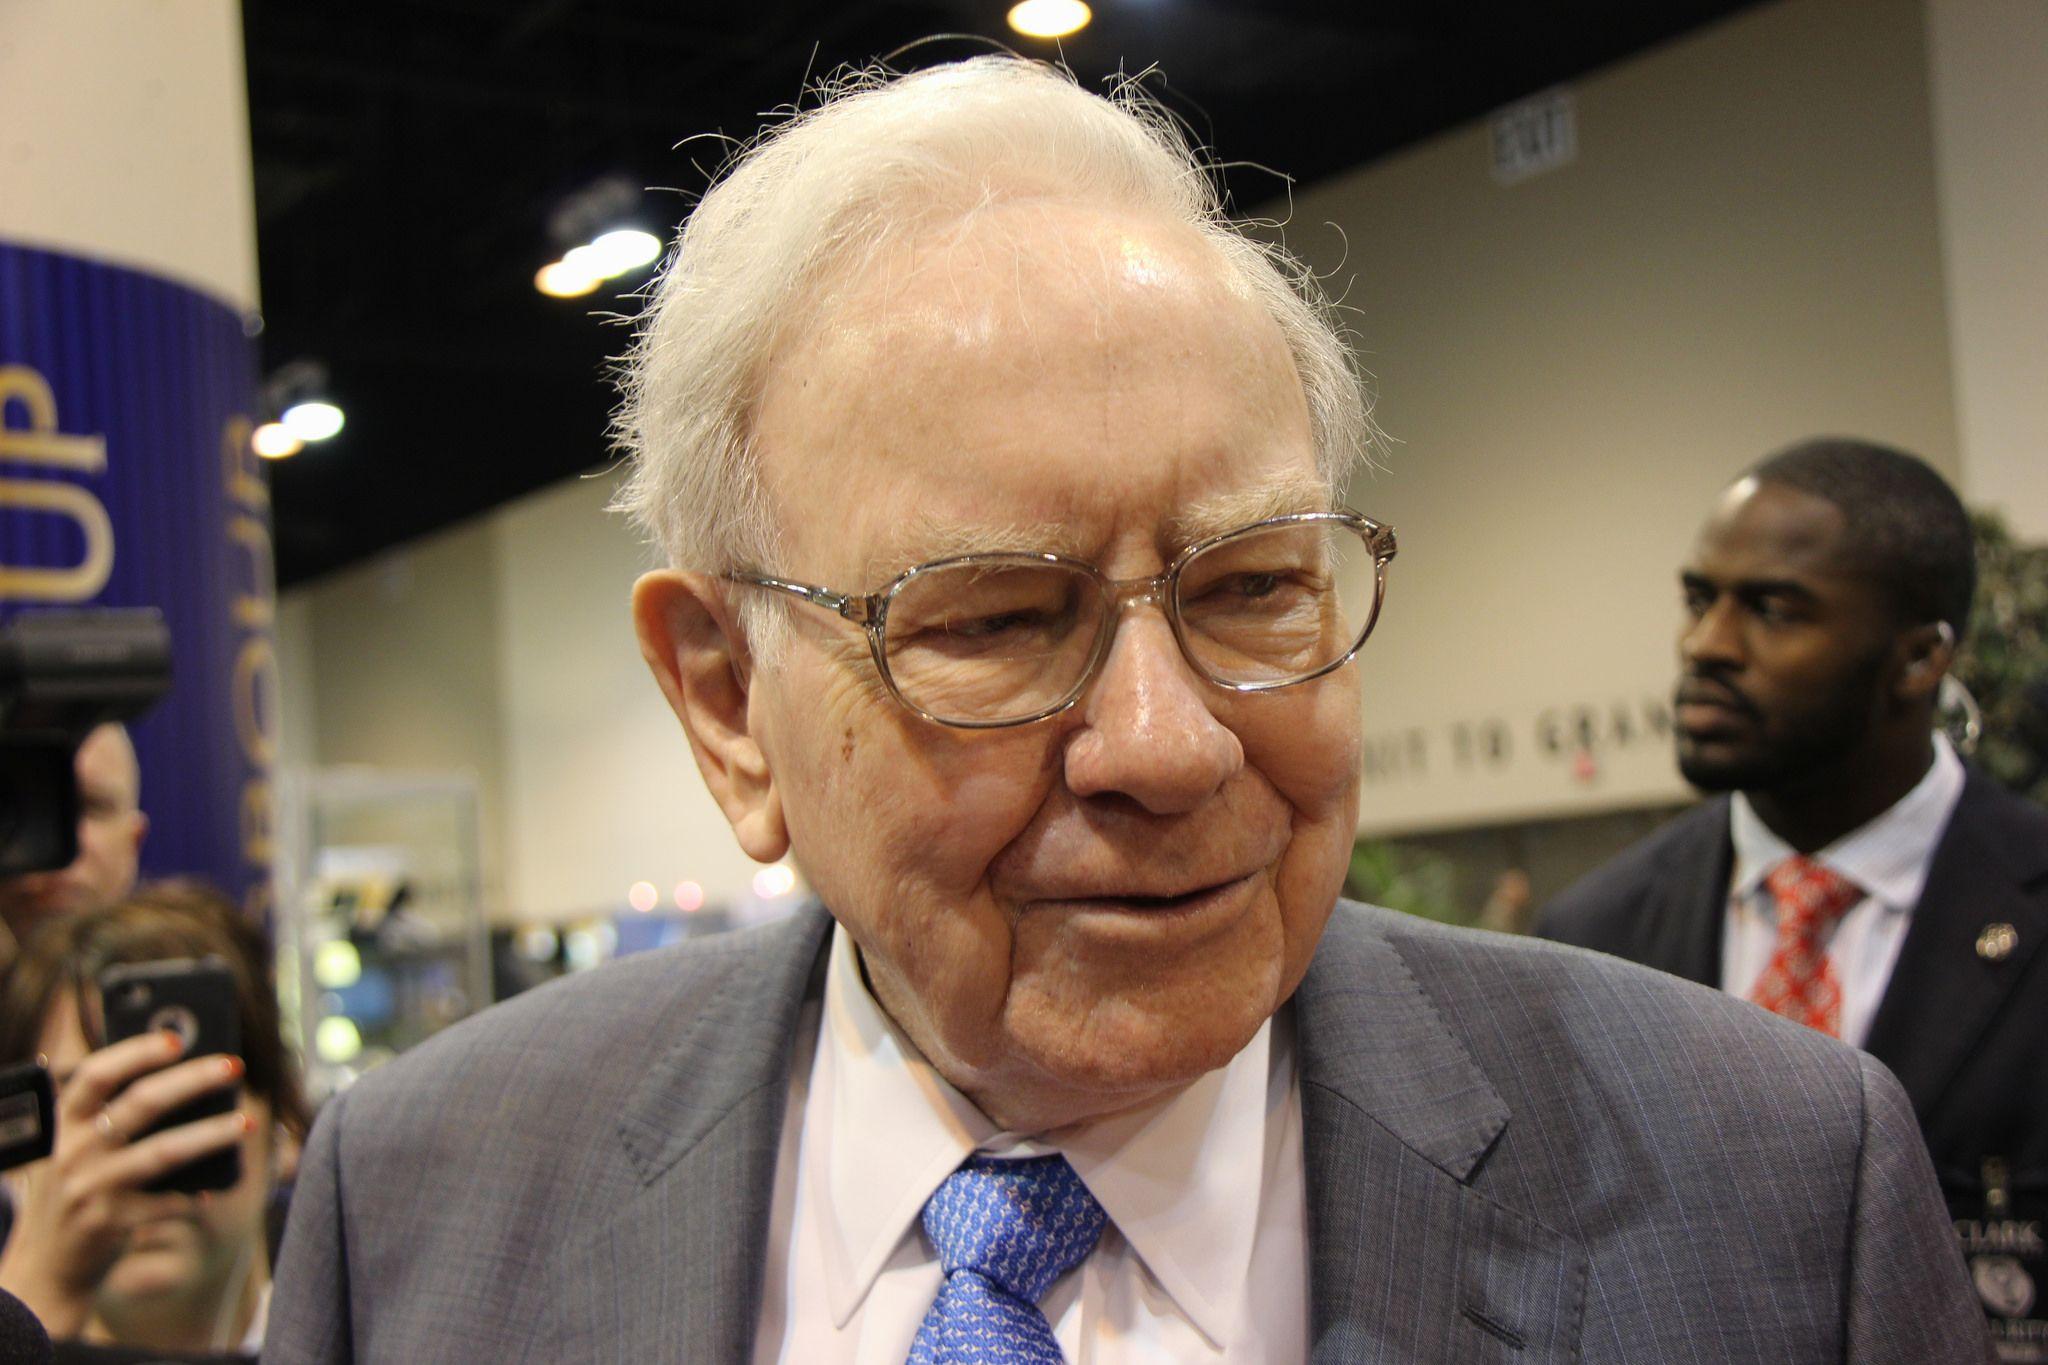 How Warren Buffett Thinks We Should Fix Social Security